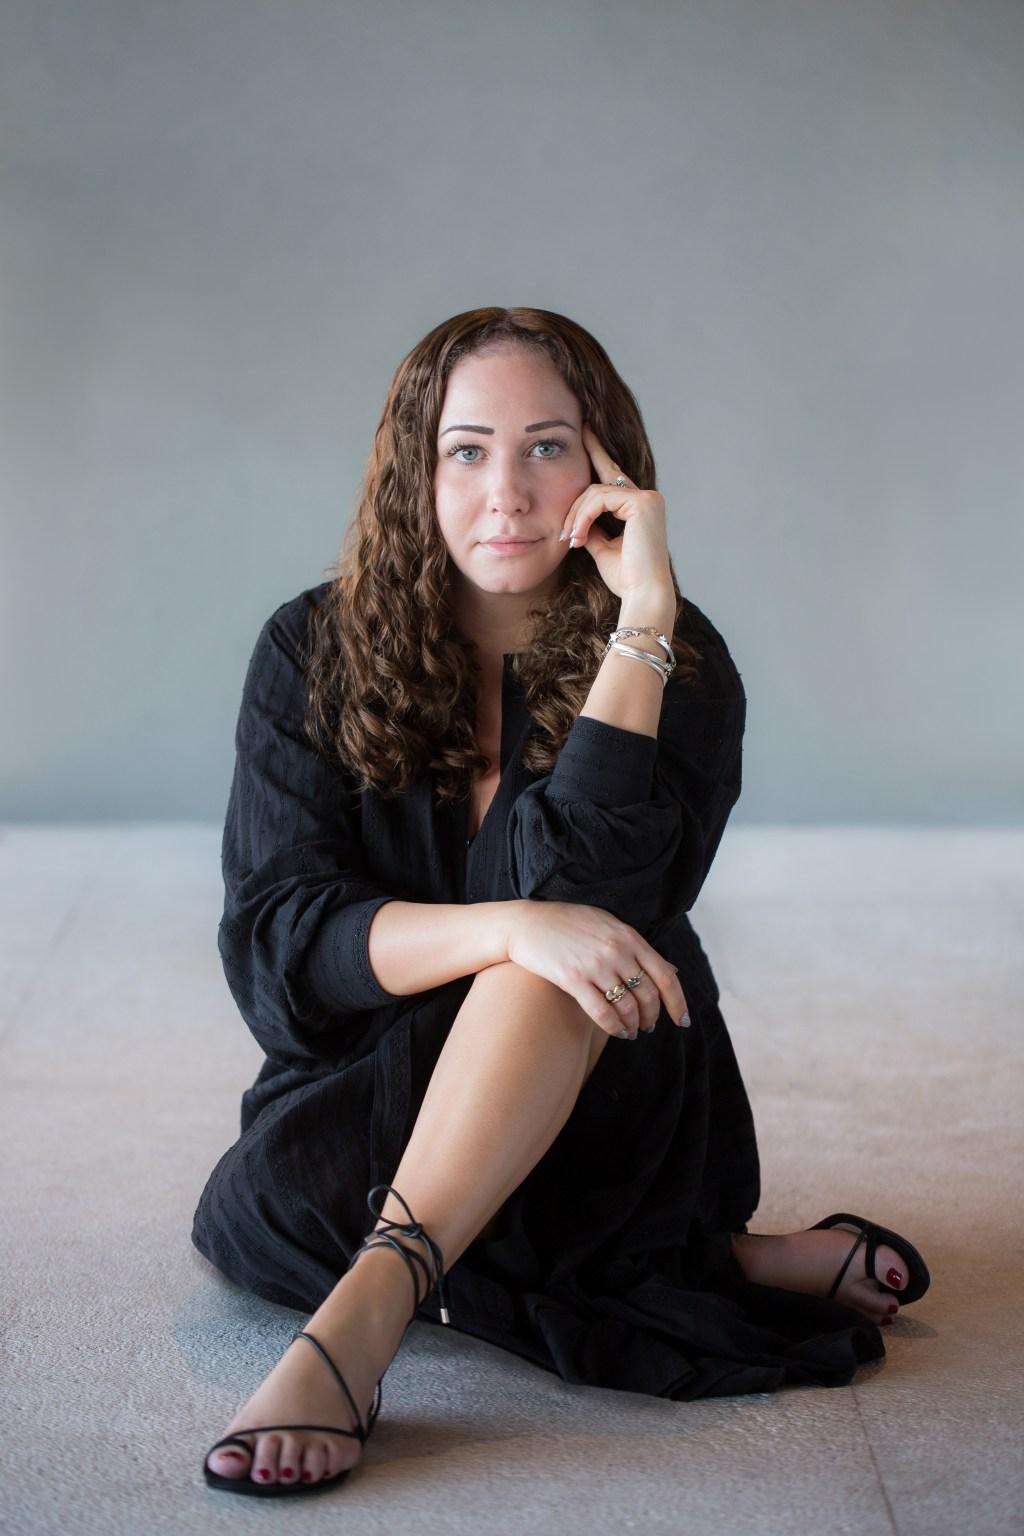 CARRIE GOLDBERG: Travel & Weddings Director, Harpers Bazaar